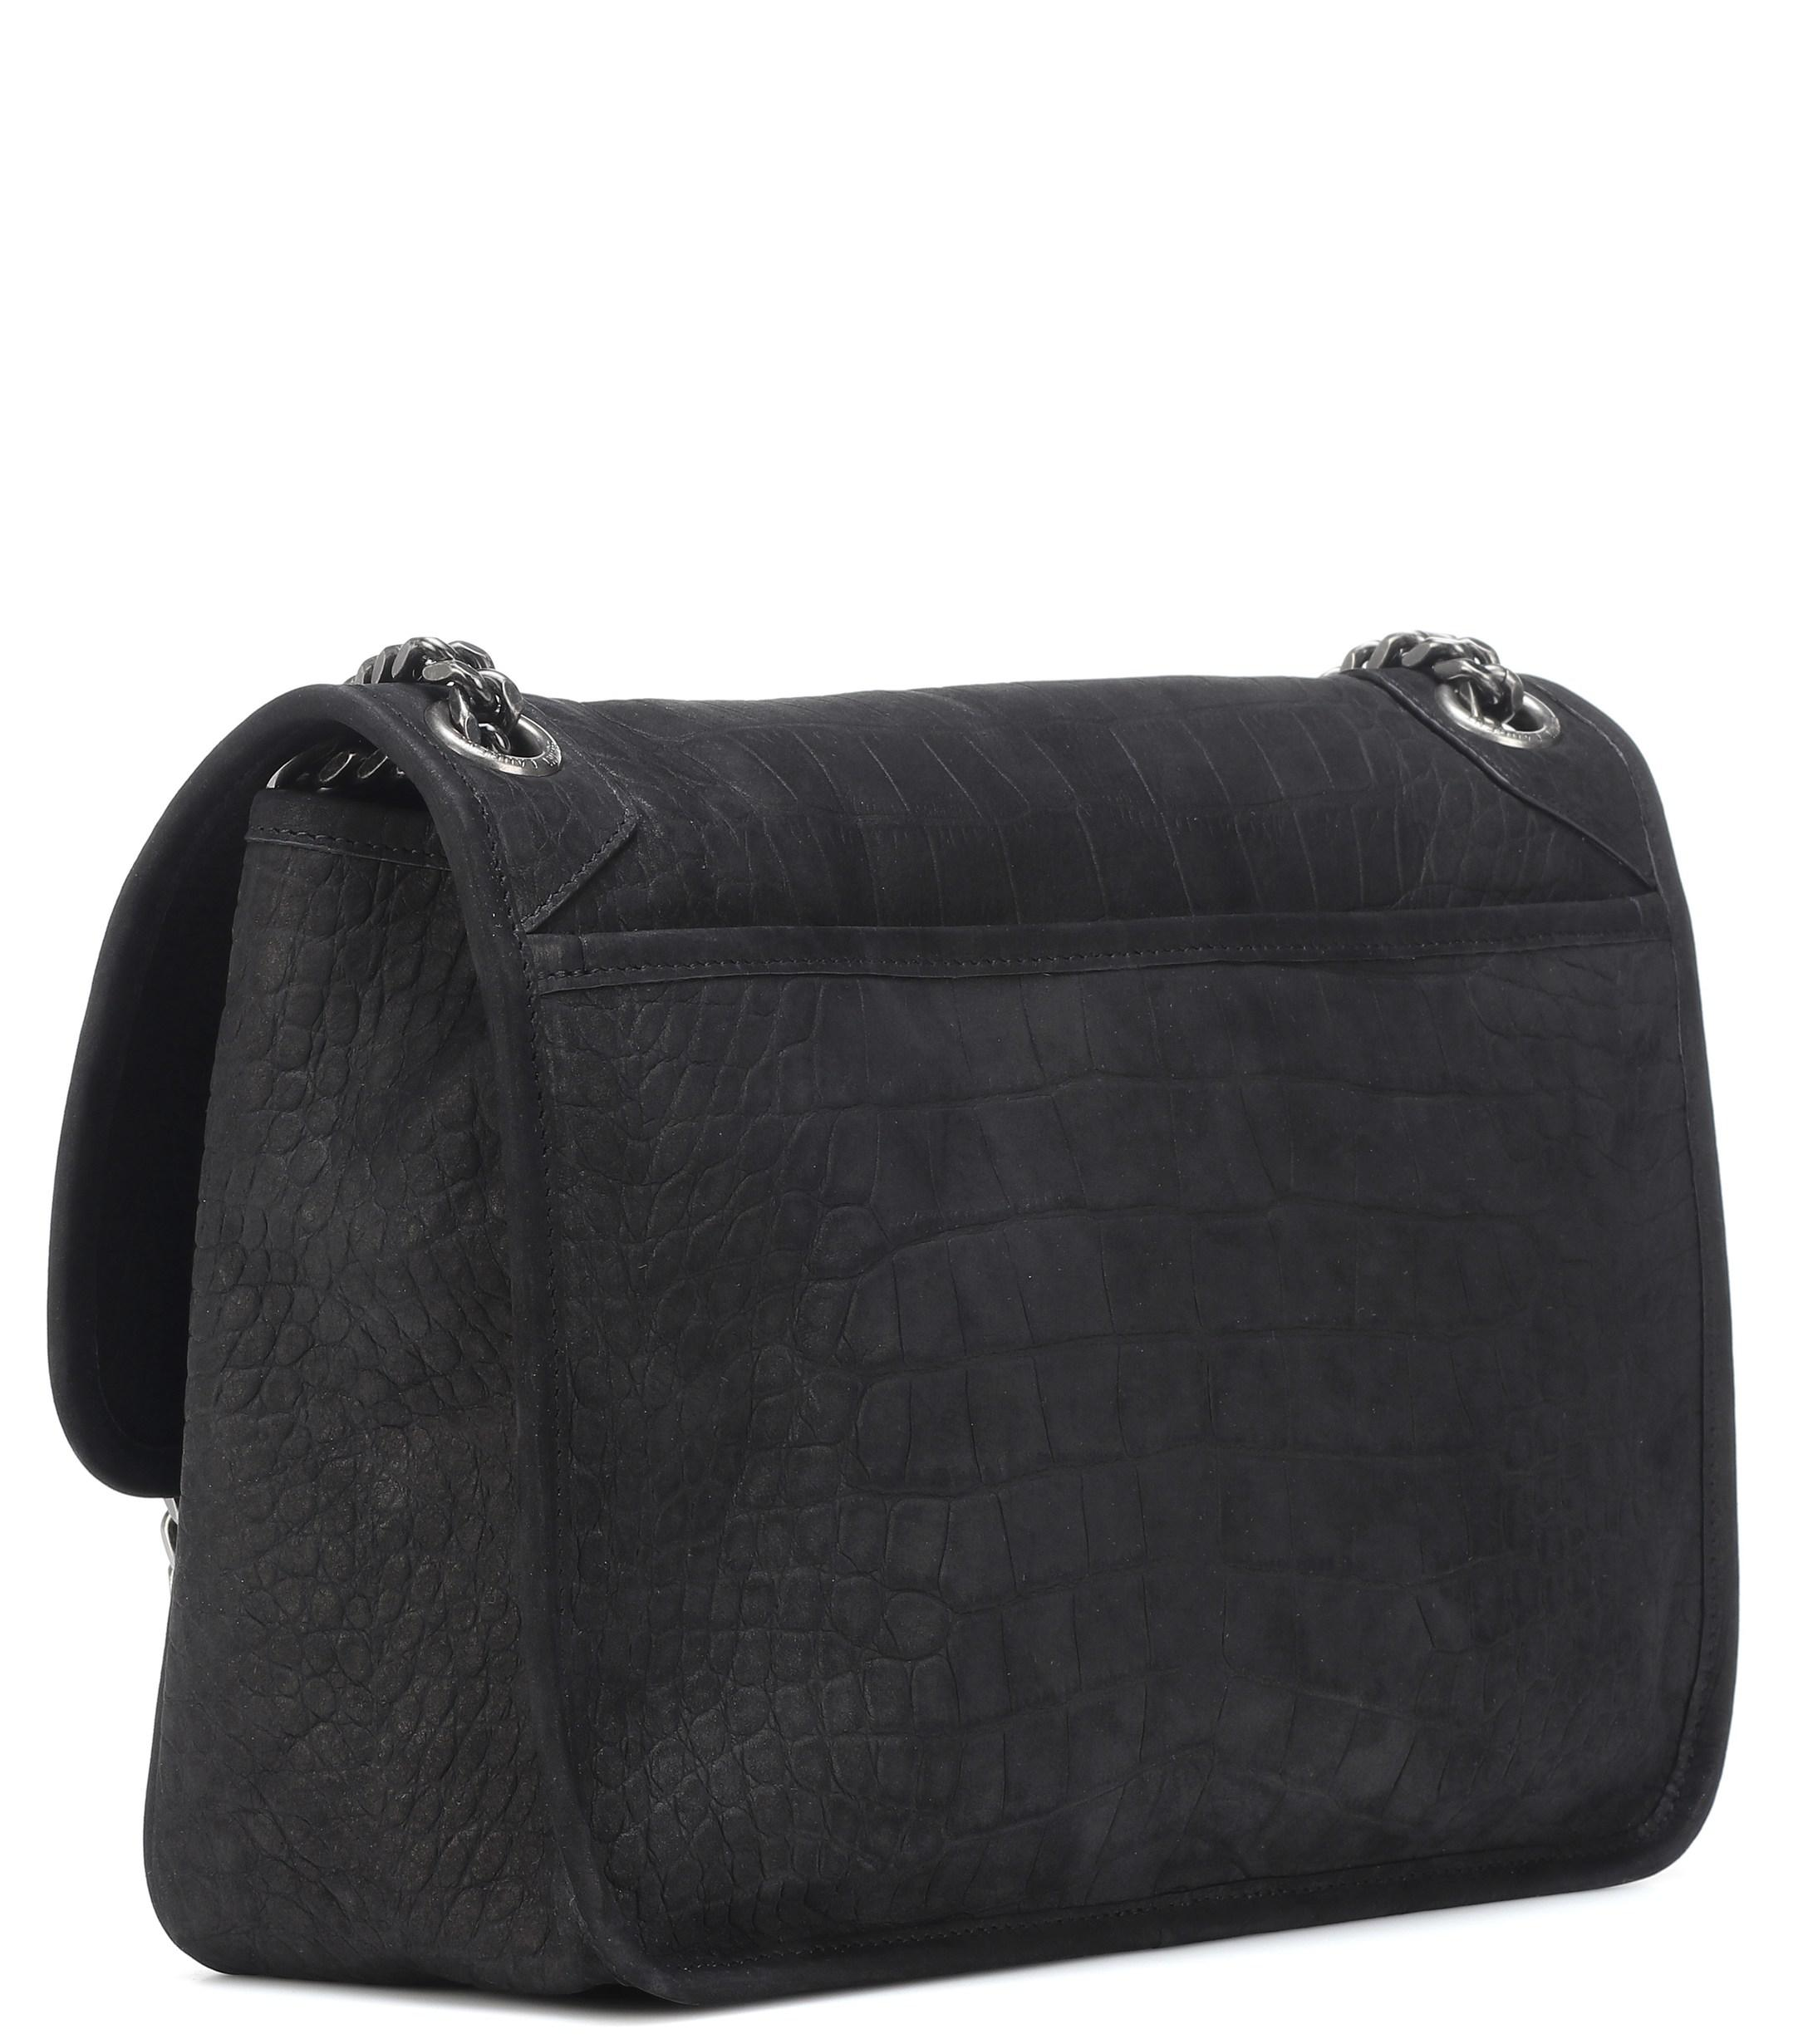 51ec27f6f442 Saint Laurent - Black Medium Niki Suede Shoulder Bag - Lyst. View fullscreen